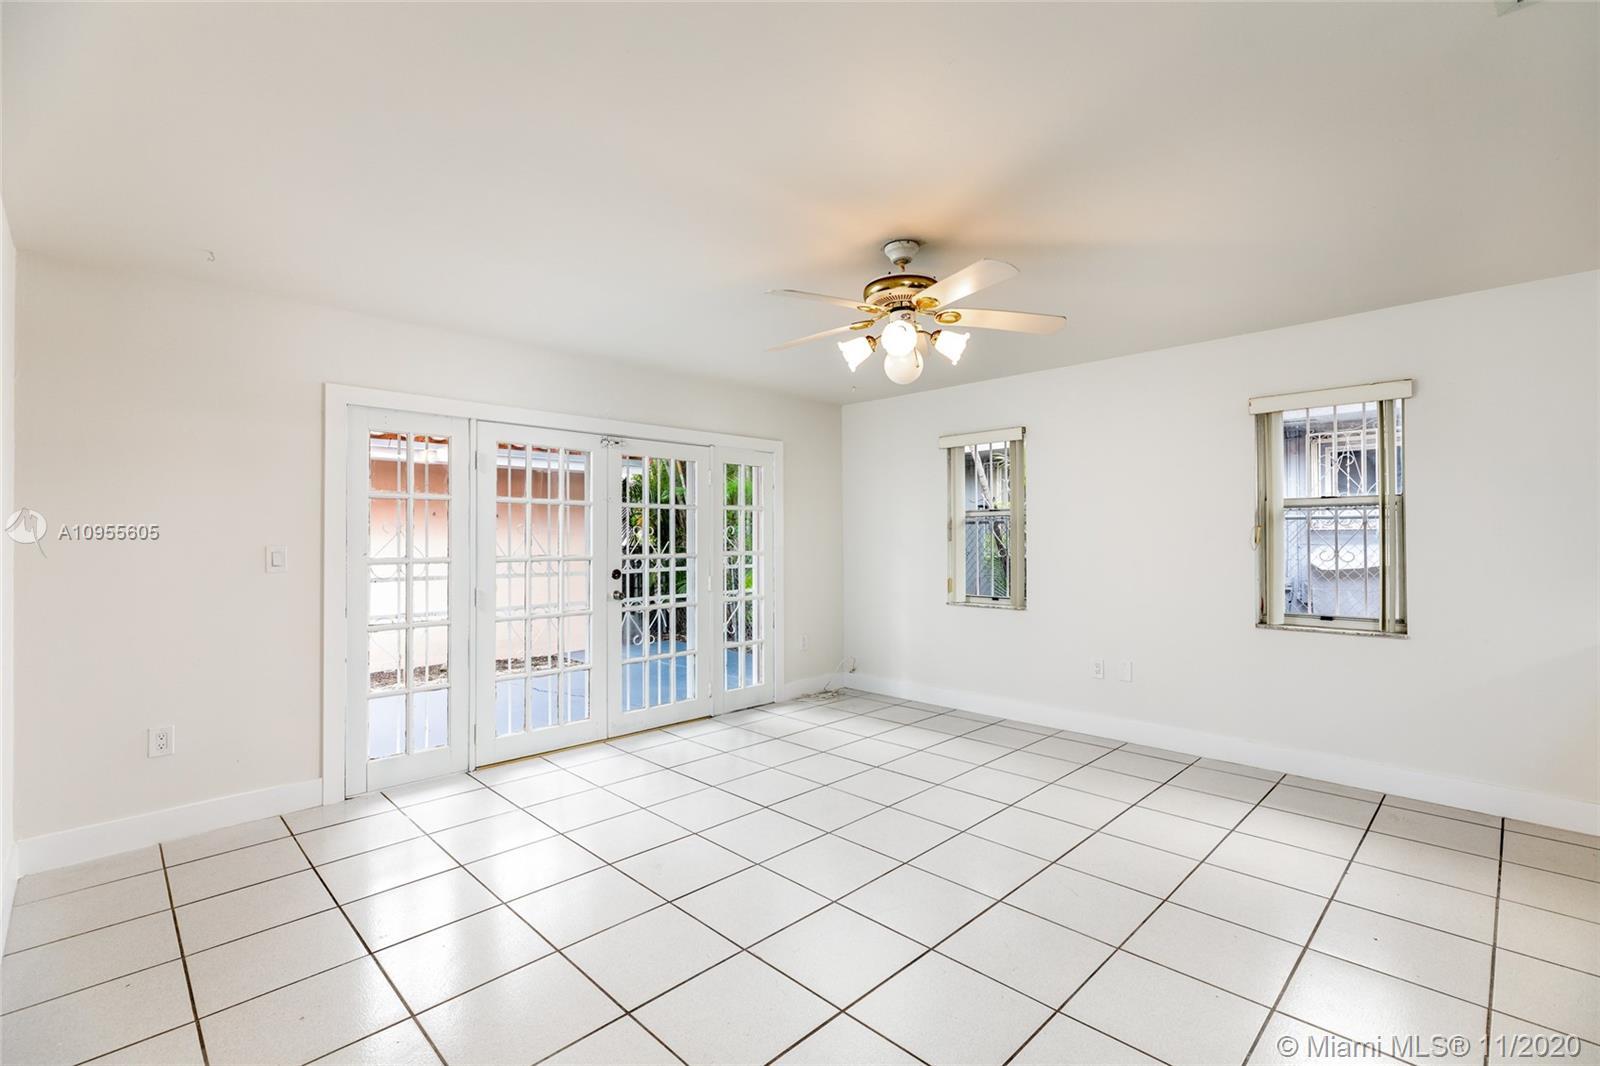 /  2820 sq. ft. $ 2020-11-10 0 Photo